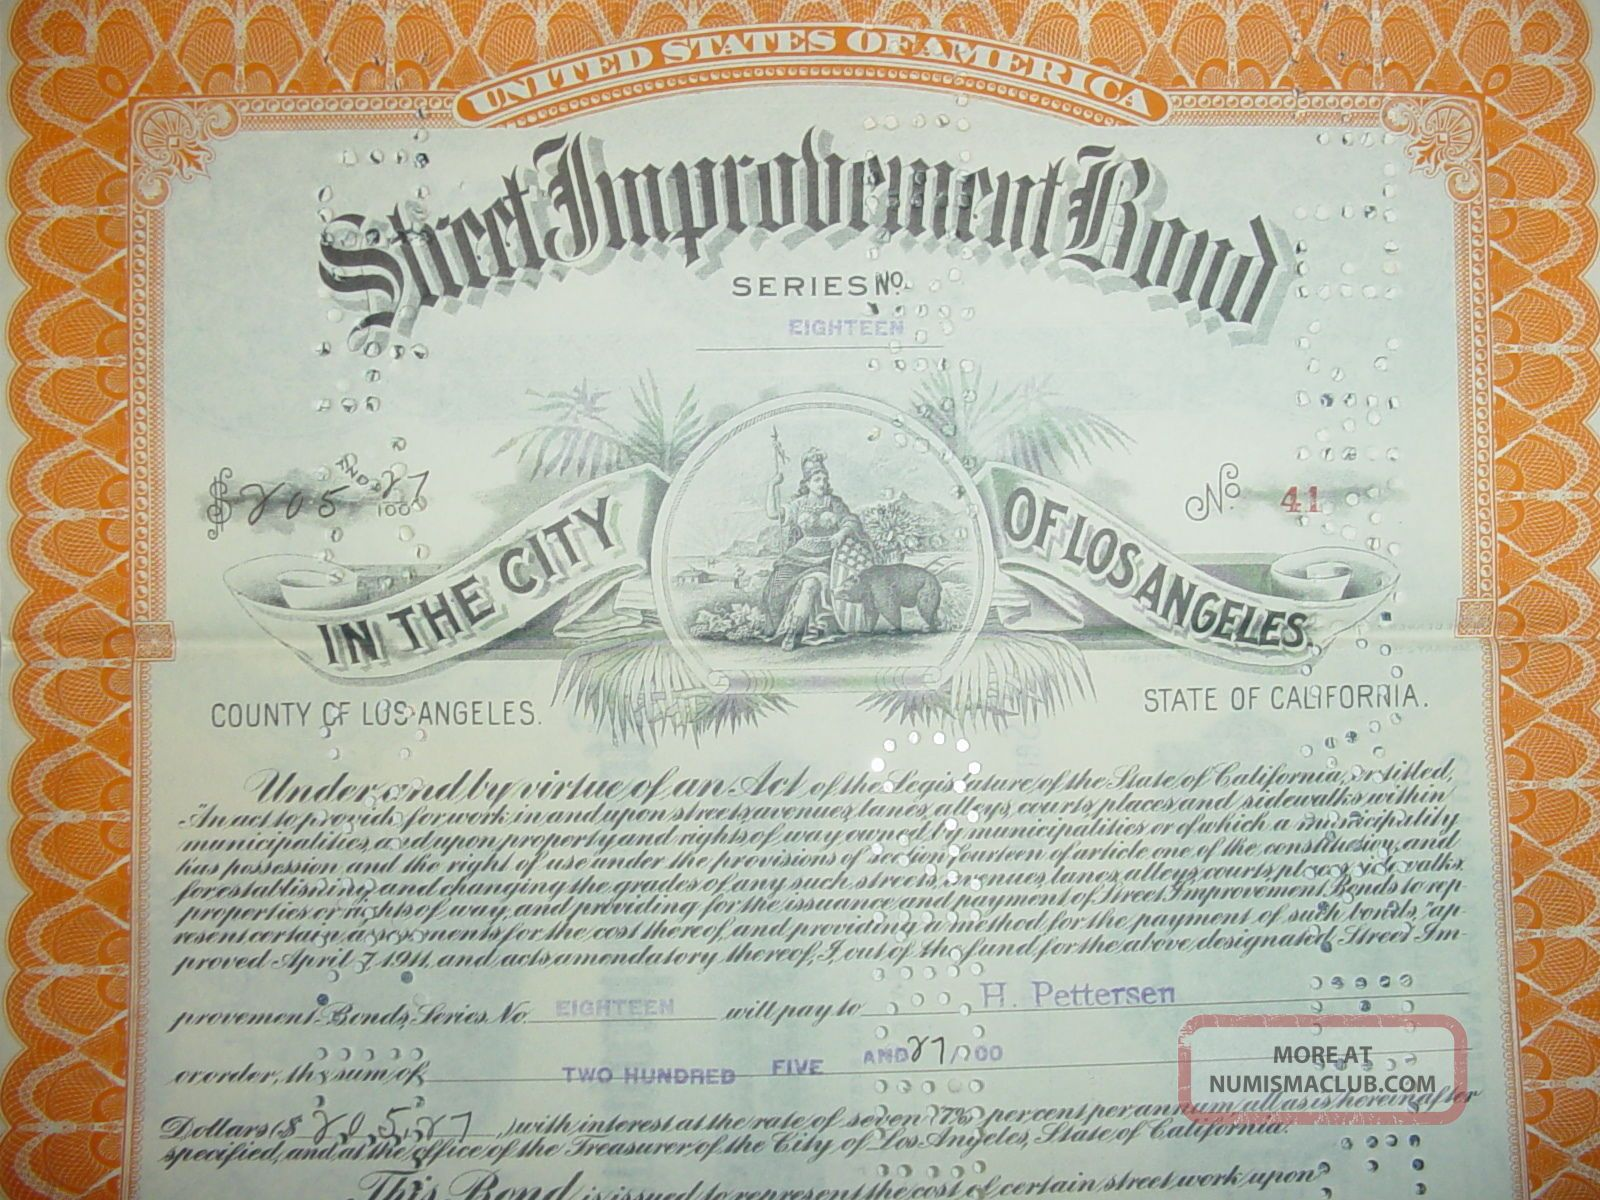 City Of Los Angeles Street Improvement Bond California Stocks & Bonds, Scripophily photo